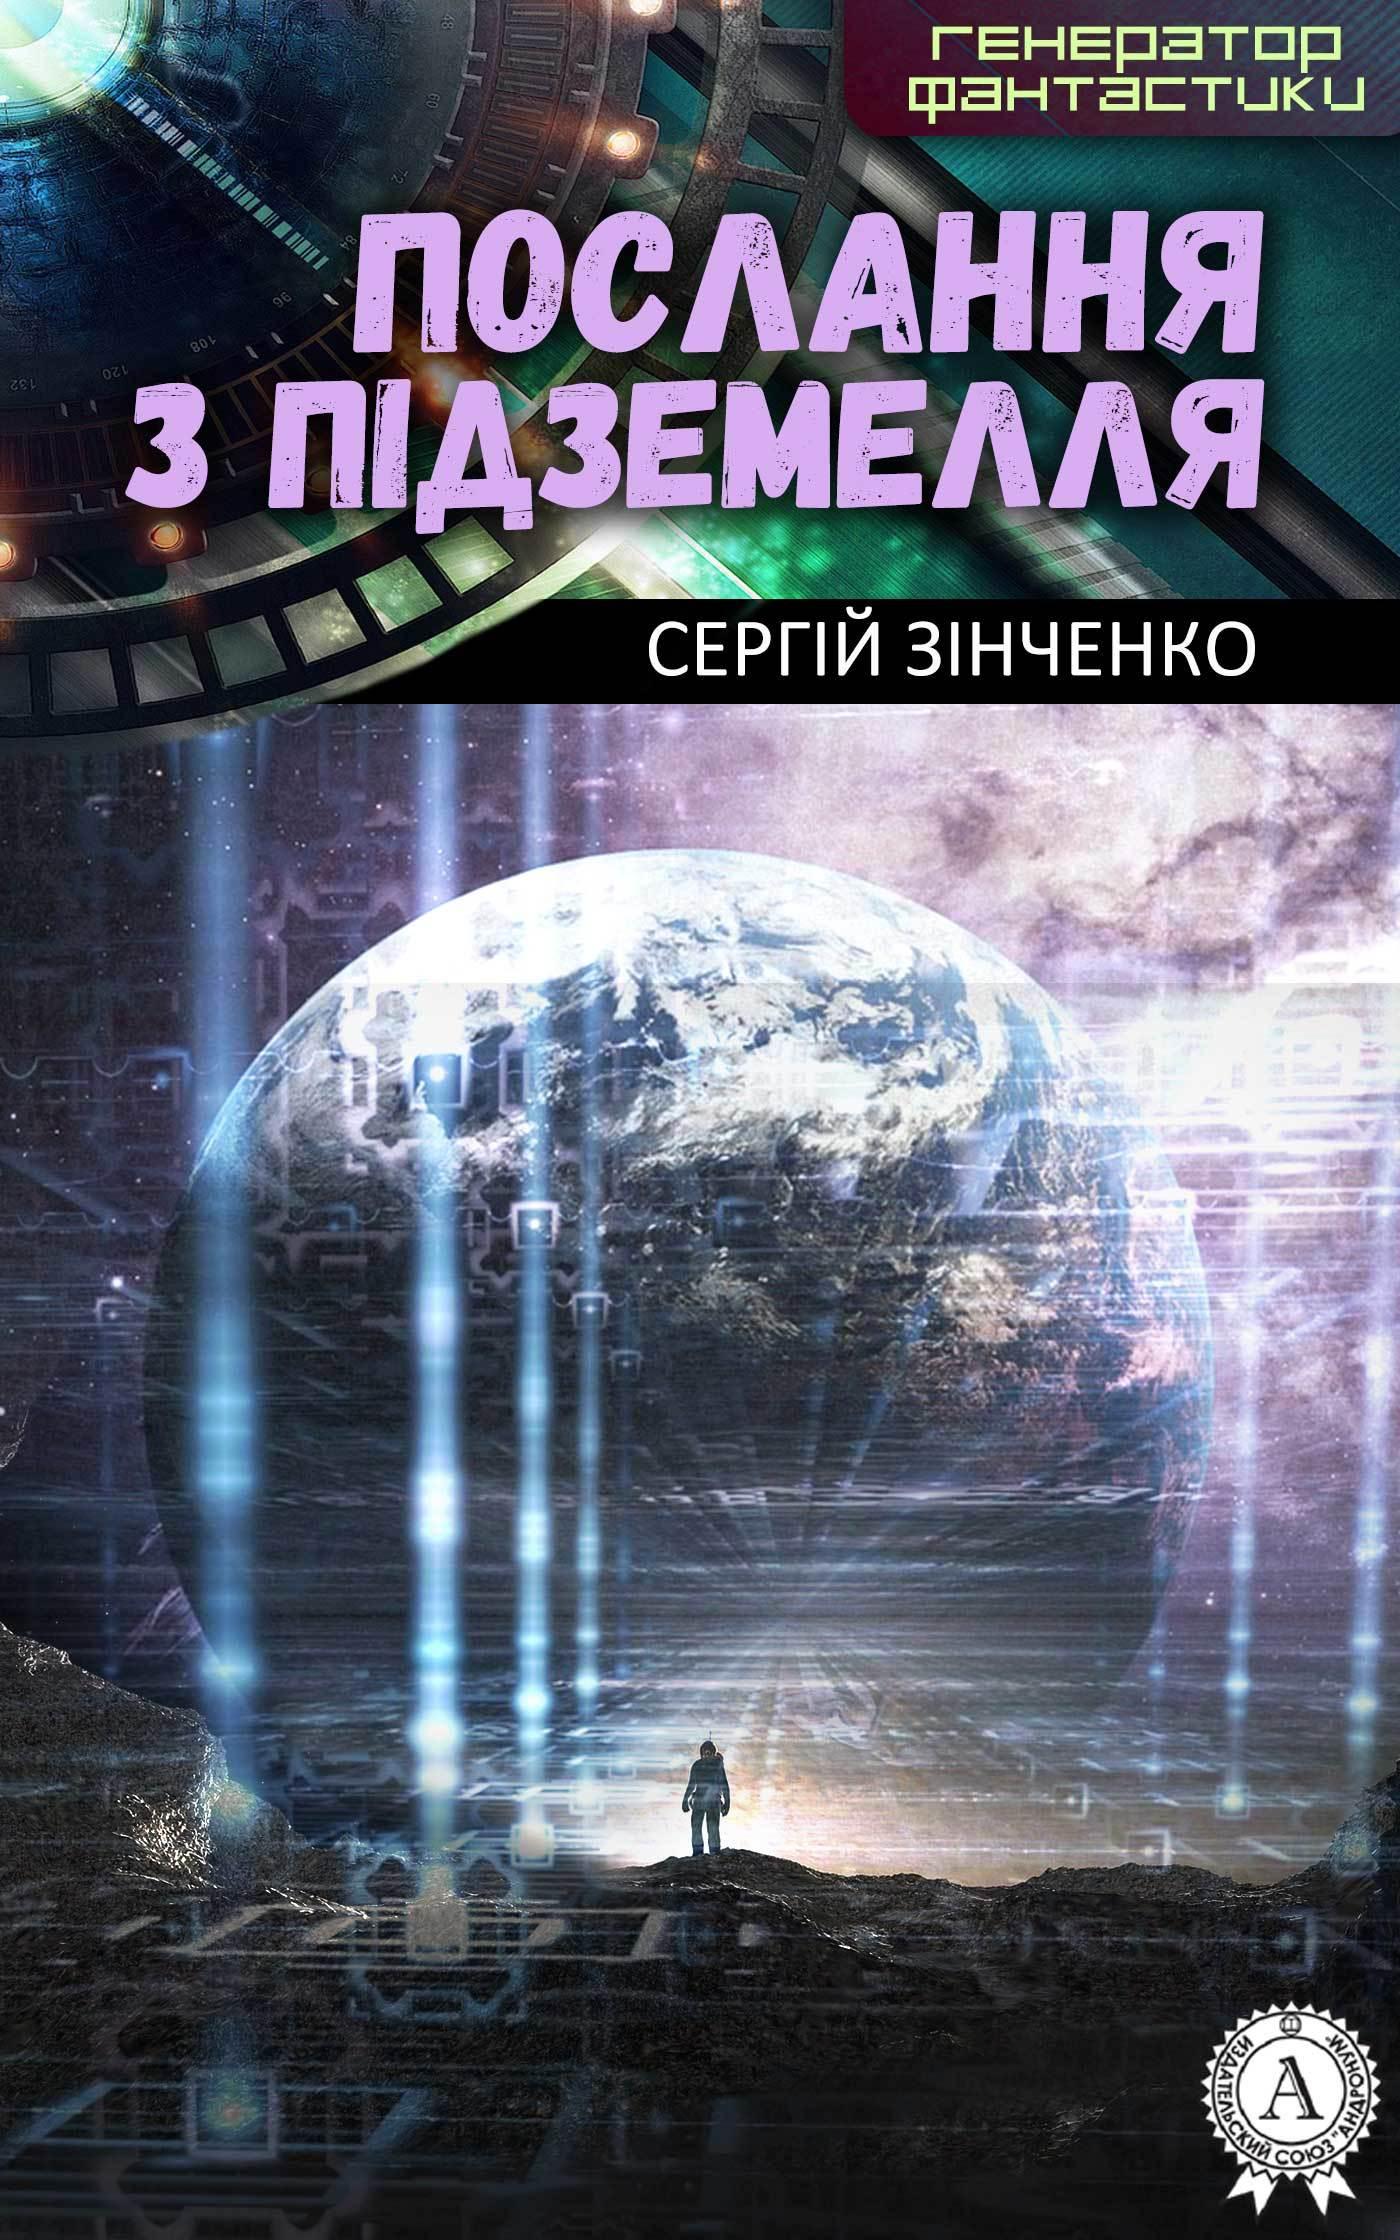 Сергй Знченко бесплатно